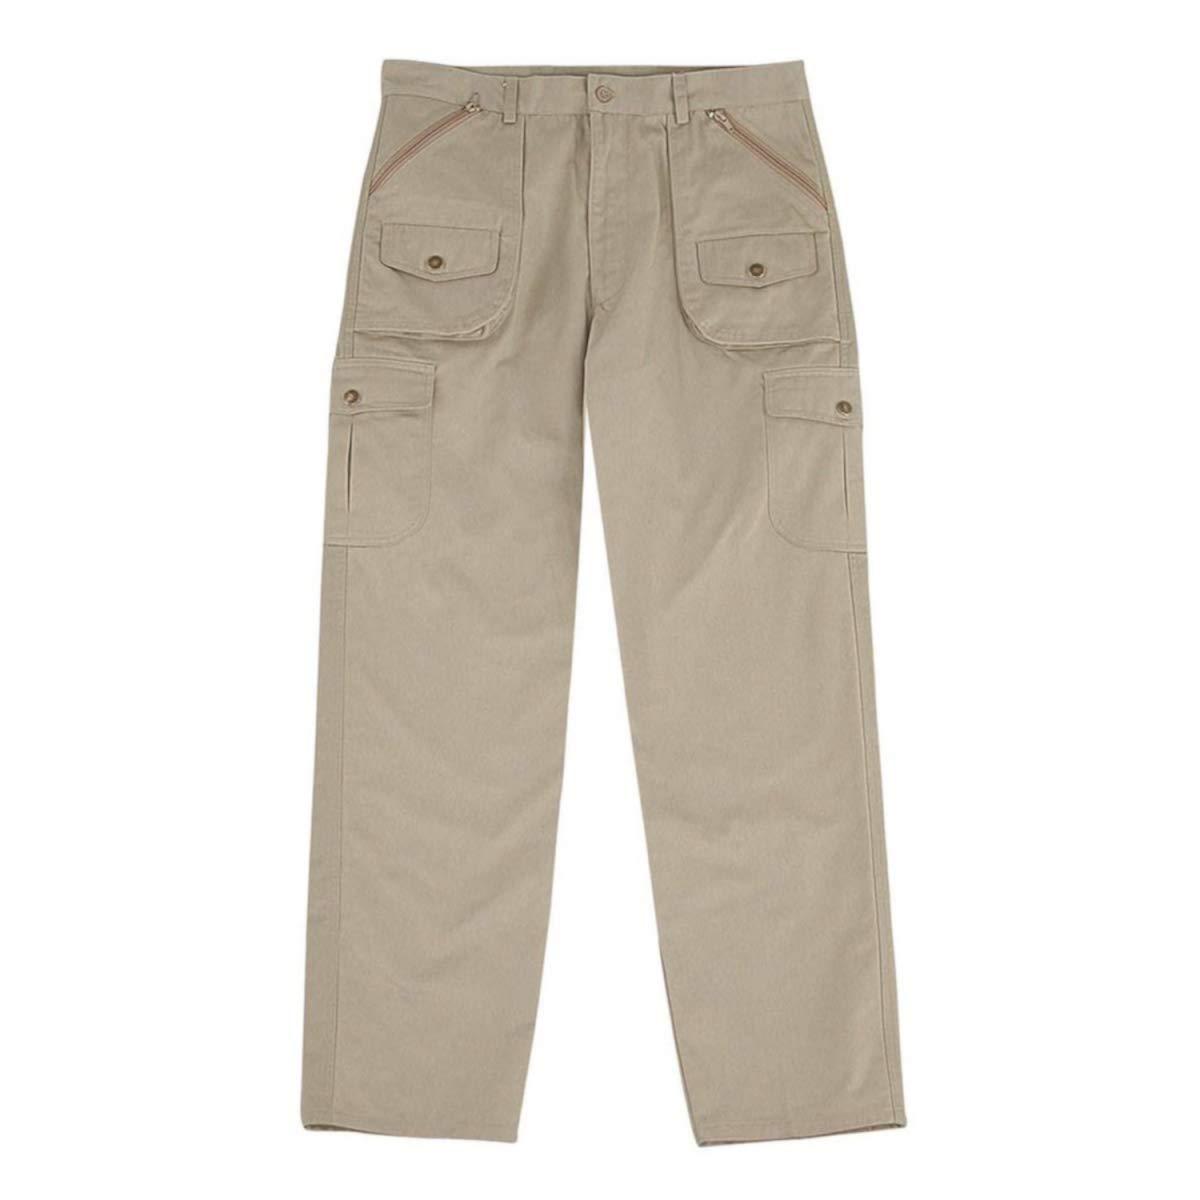 Pantalone Da Lavoro Multitasche Invernale Felpato Internamente - 46, Kaky Mariner